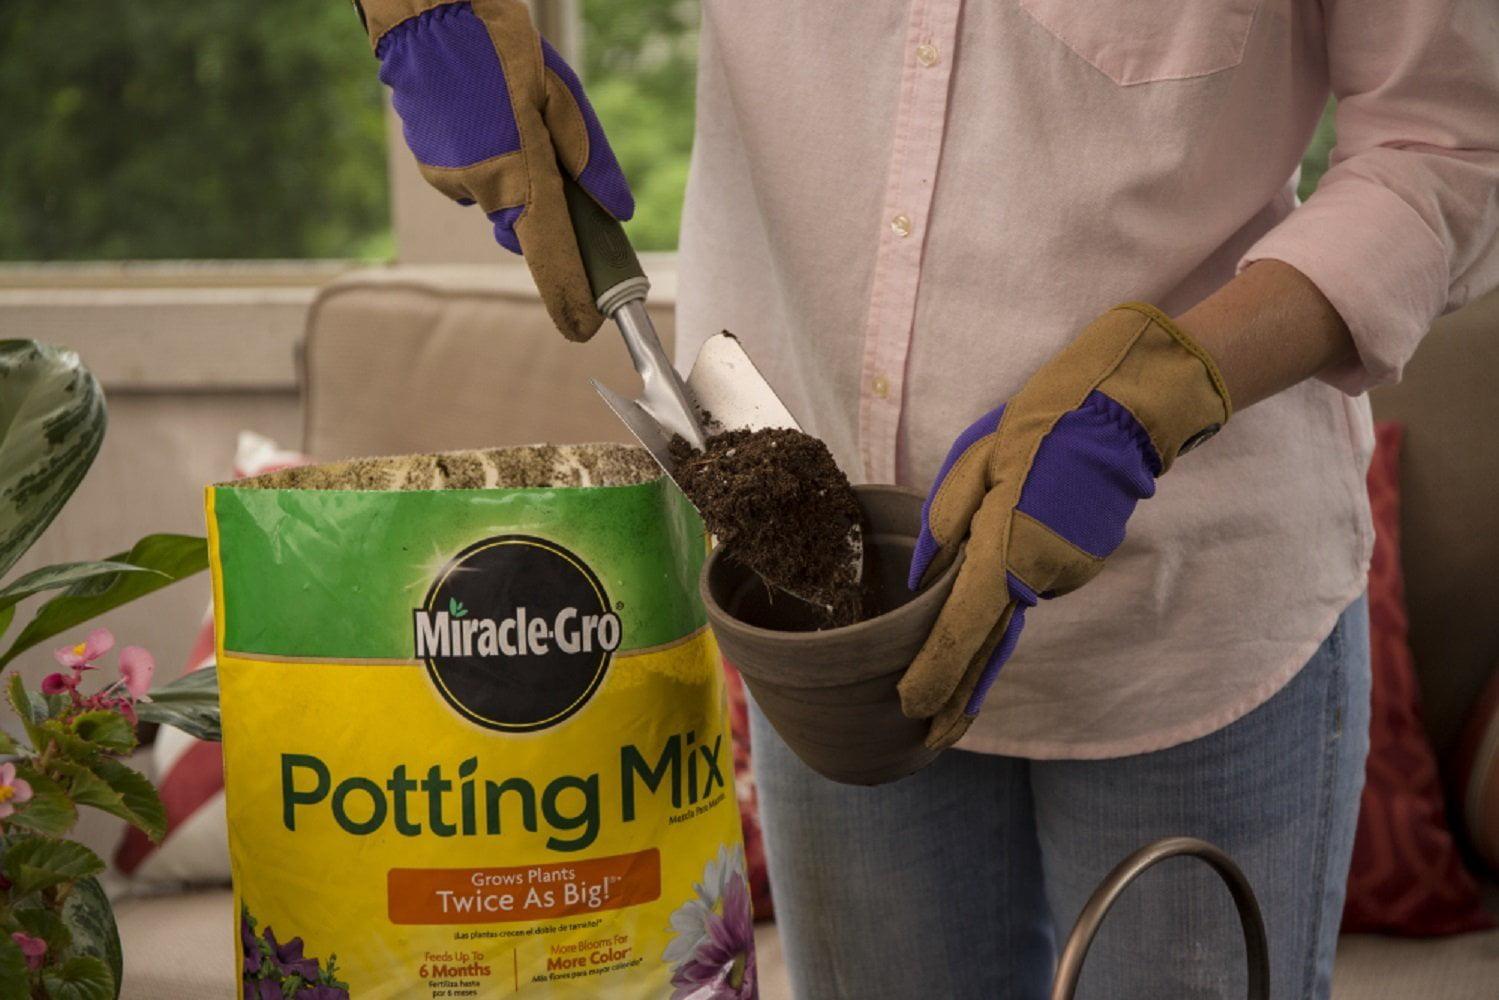 Miracle-Gro Potting Mix 8 QT MGRO POTTING MIX, Feeds up to six ...